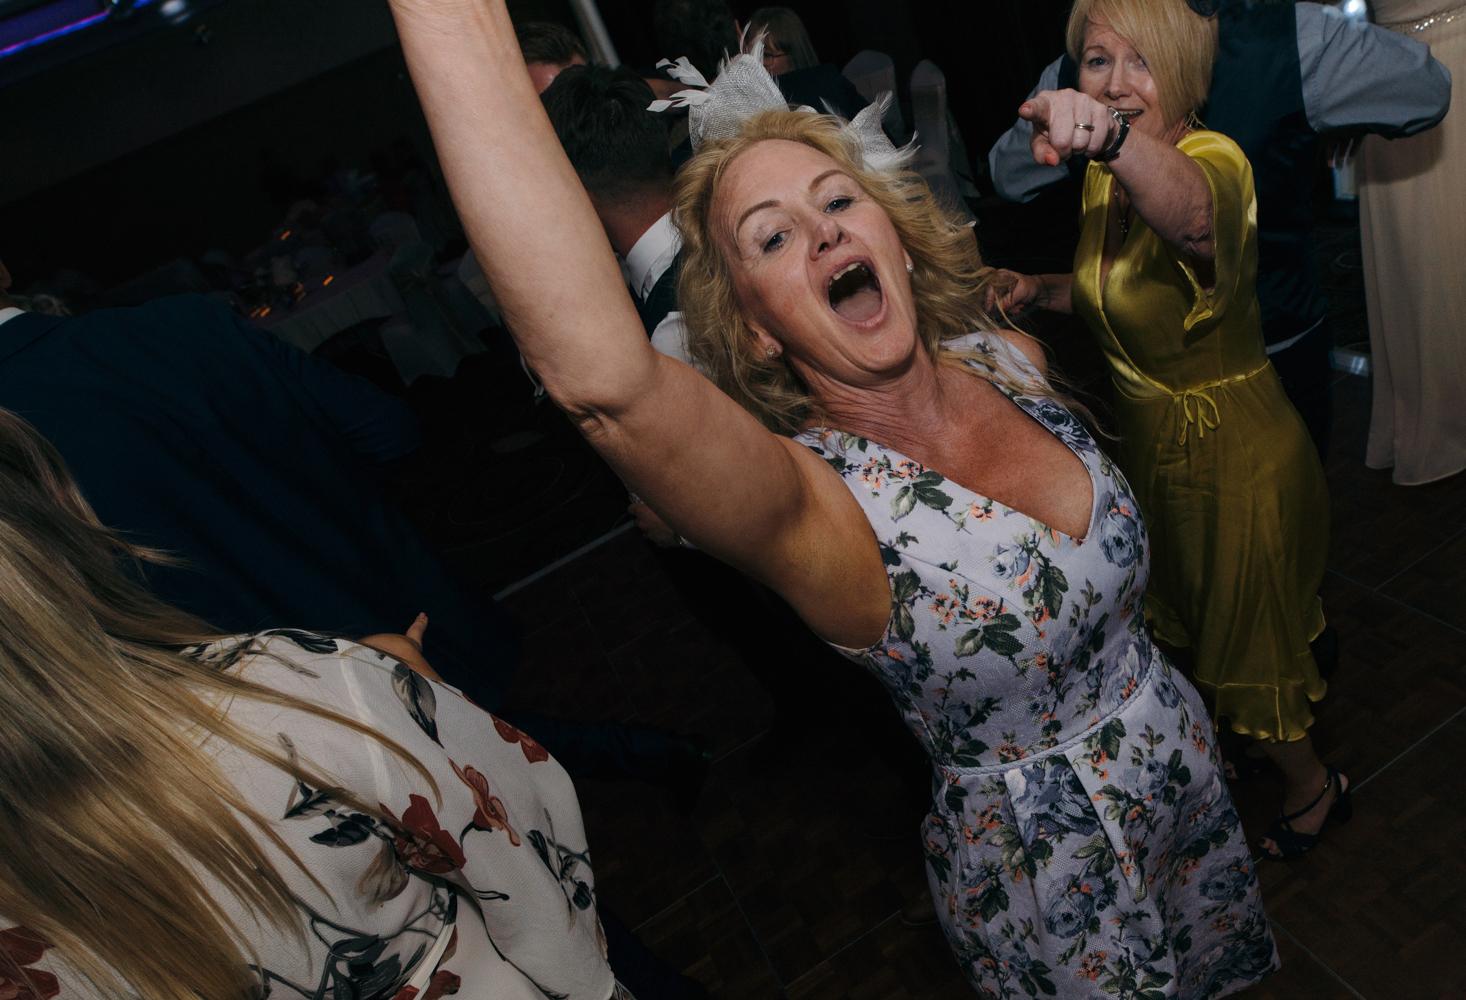 One of the wedding guests really enjoying herself on the dancefloor